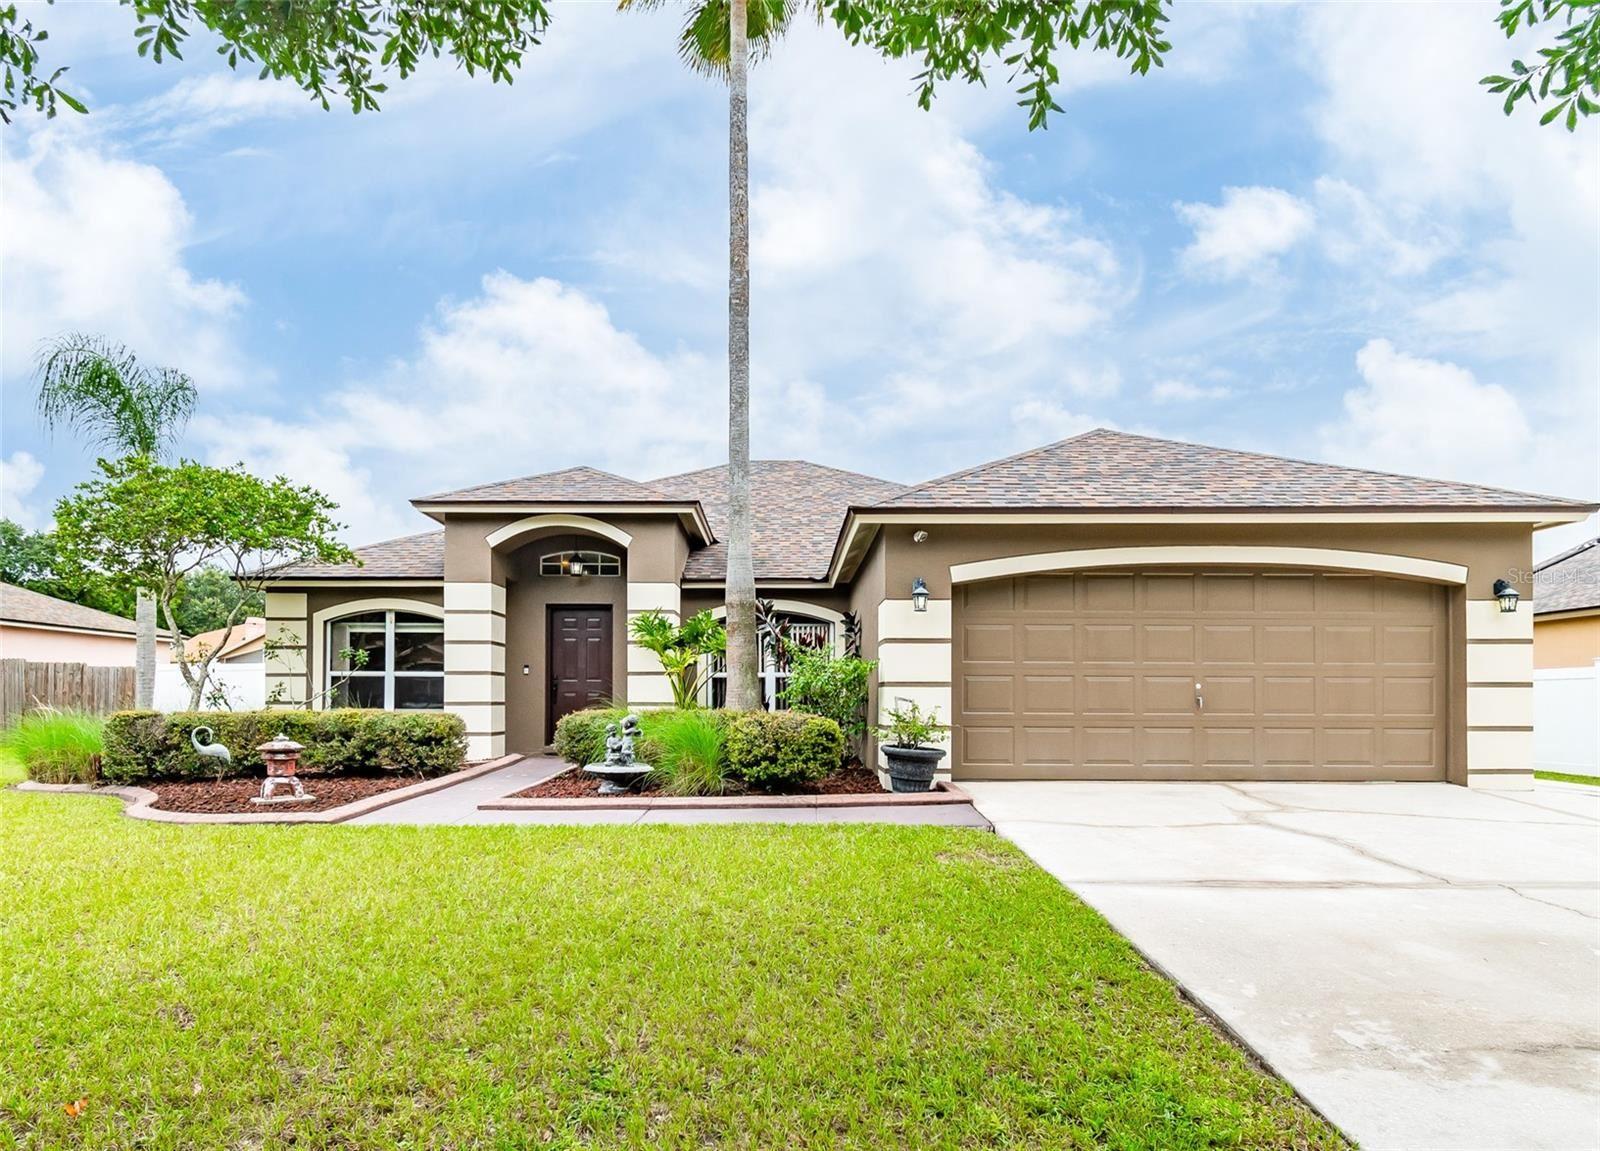 9207 SUNNYOAK DRIVE, Riverview, FL 33569 - MLS#: T3326305